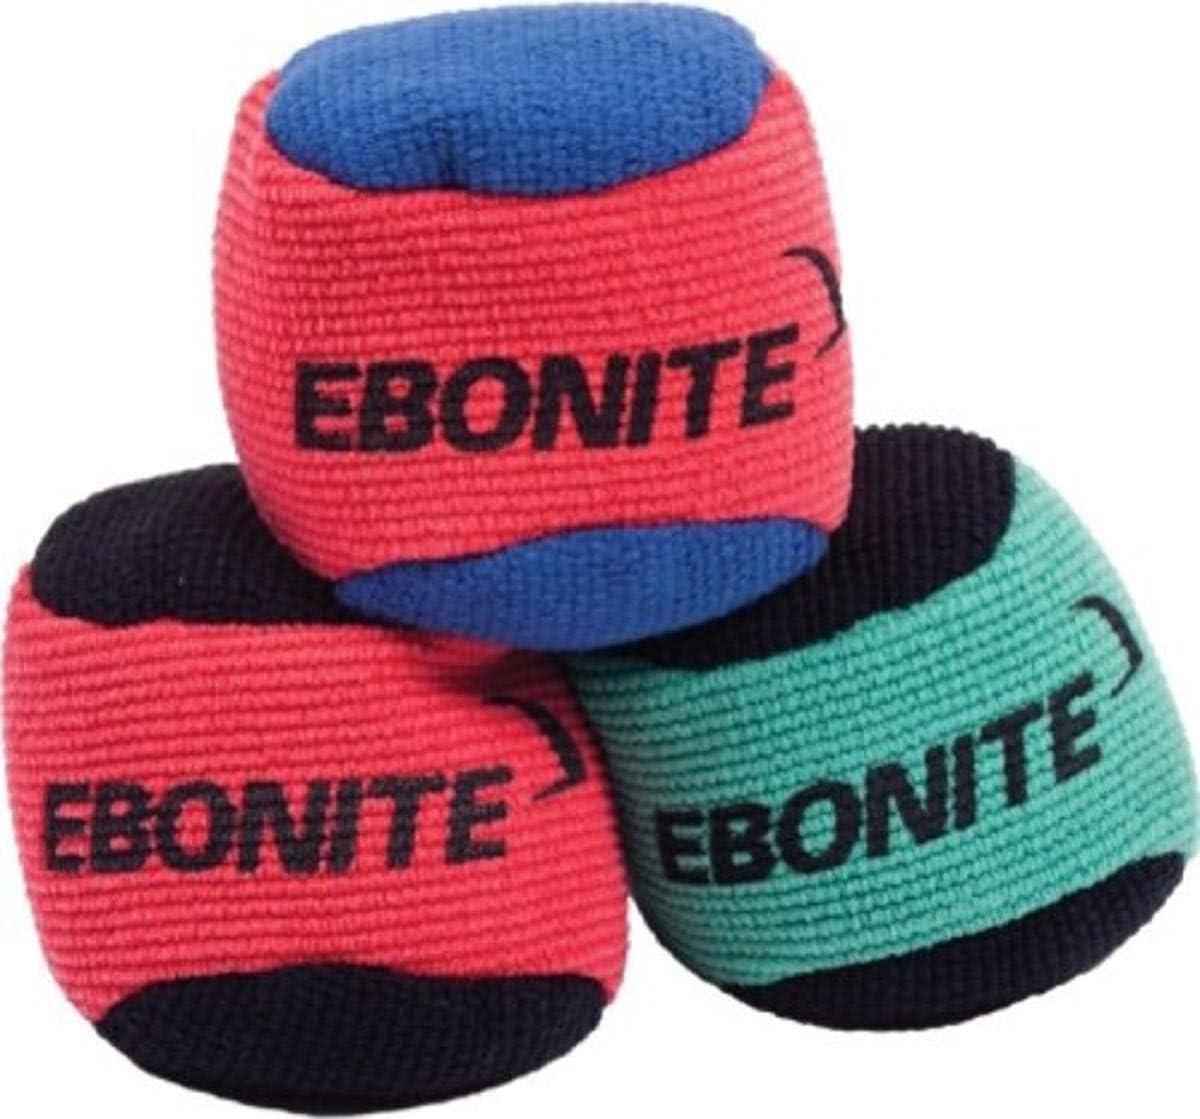 Ebonite Ultra NEW Dry Ball online shopping Grip